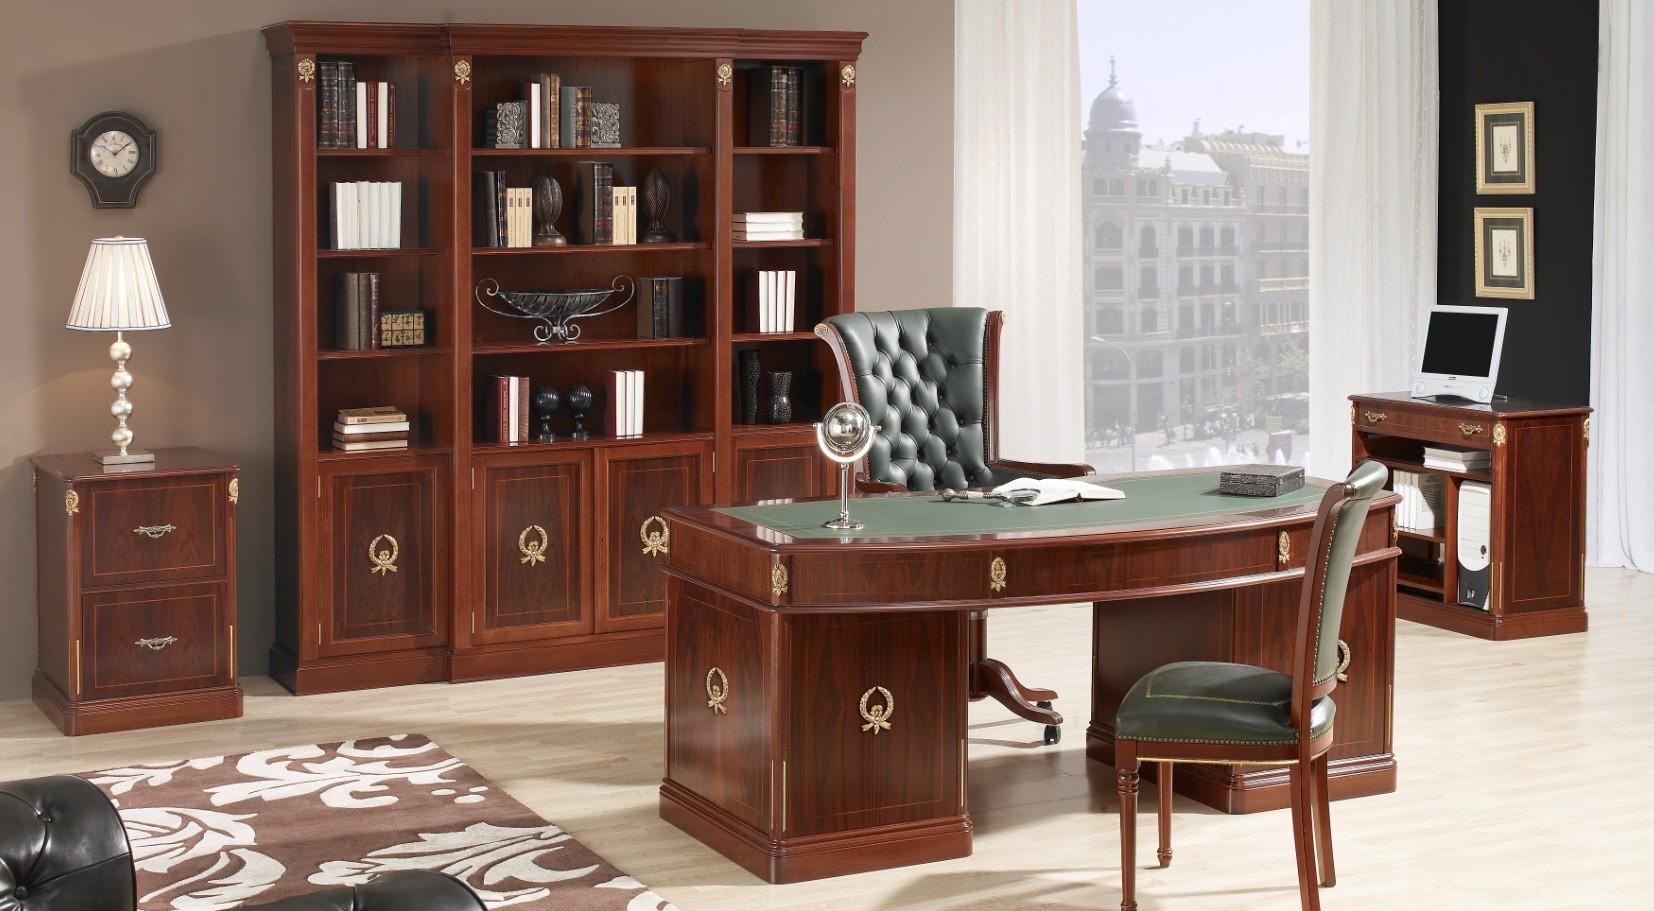 Mesas de despacho cl sicas espacios de trabajo acogedores - Ideas para decorar despacho abogados ...